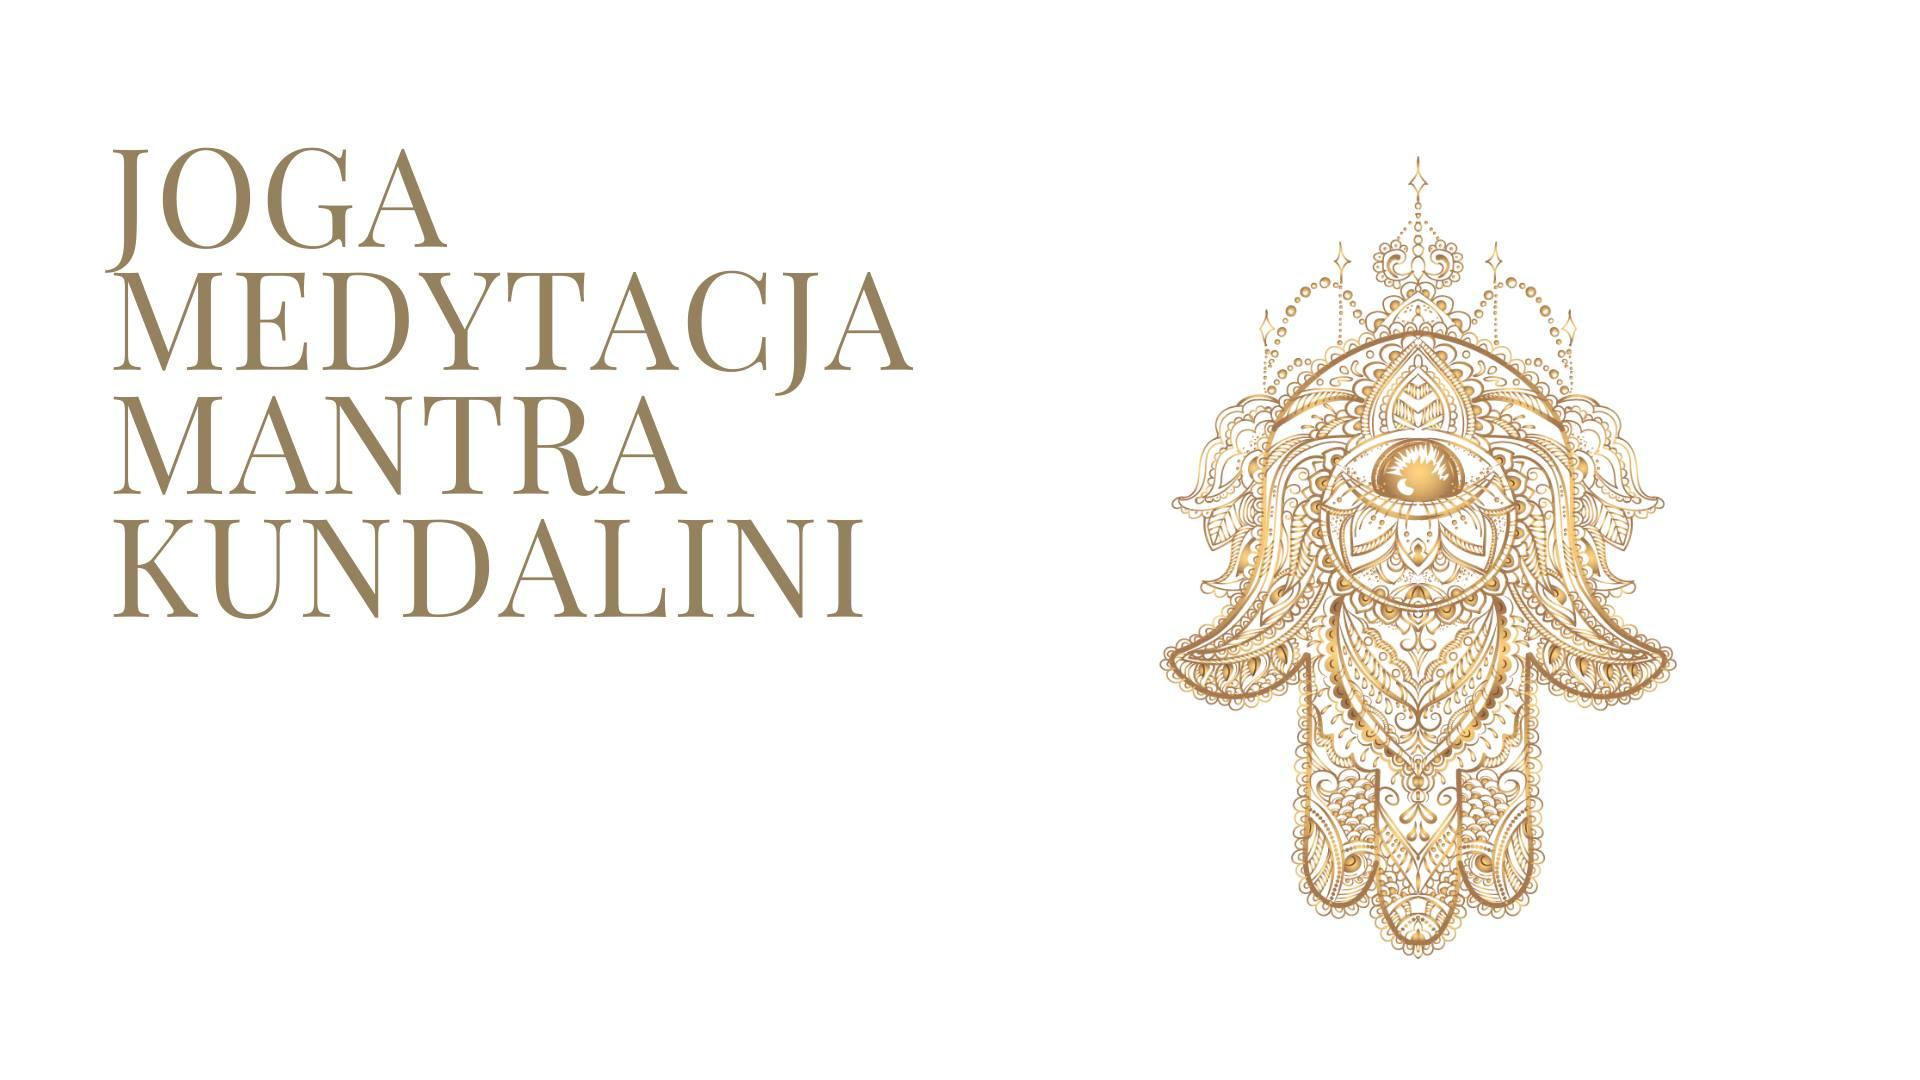 Joga Medytacja Mantra Kundalini